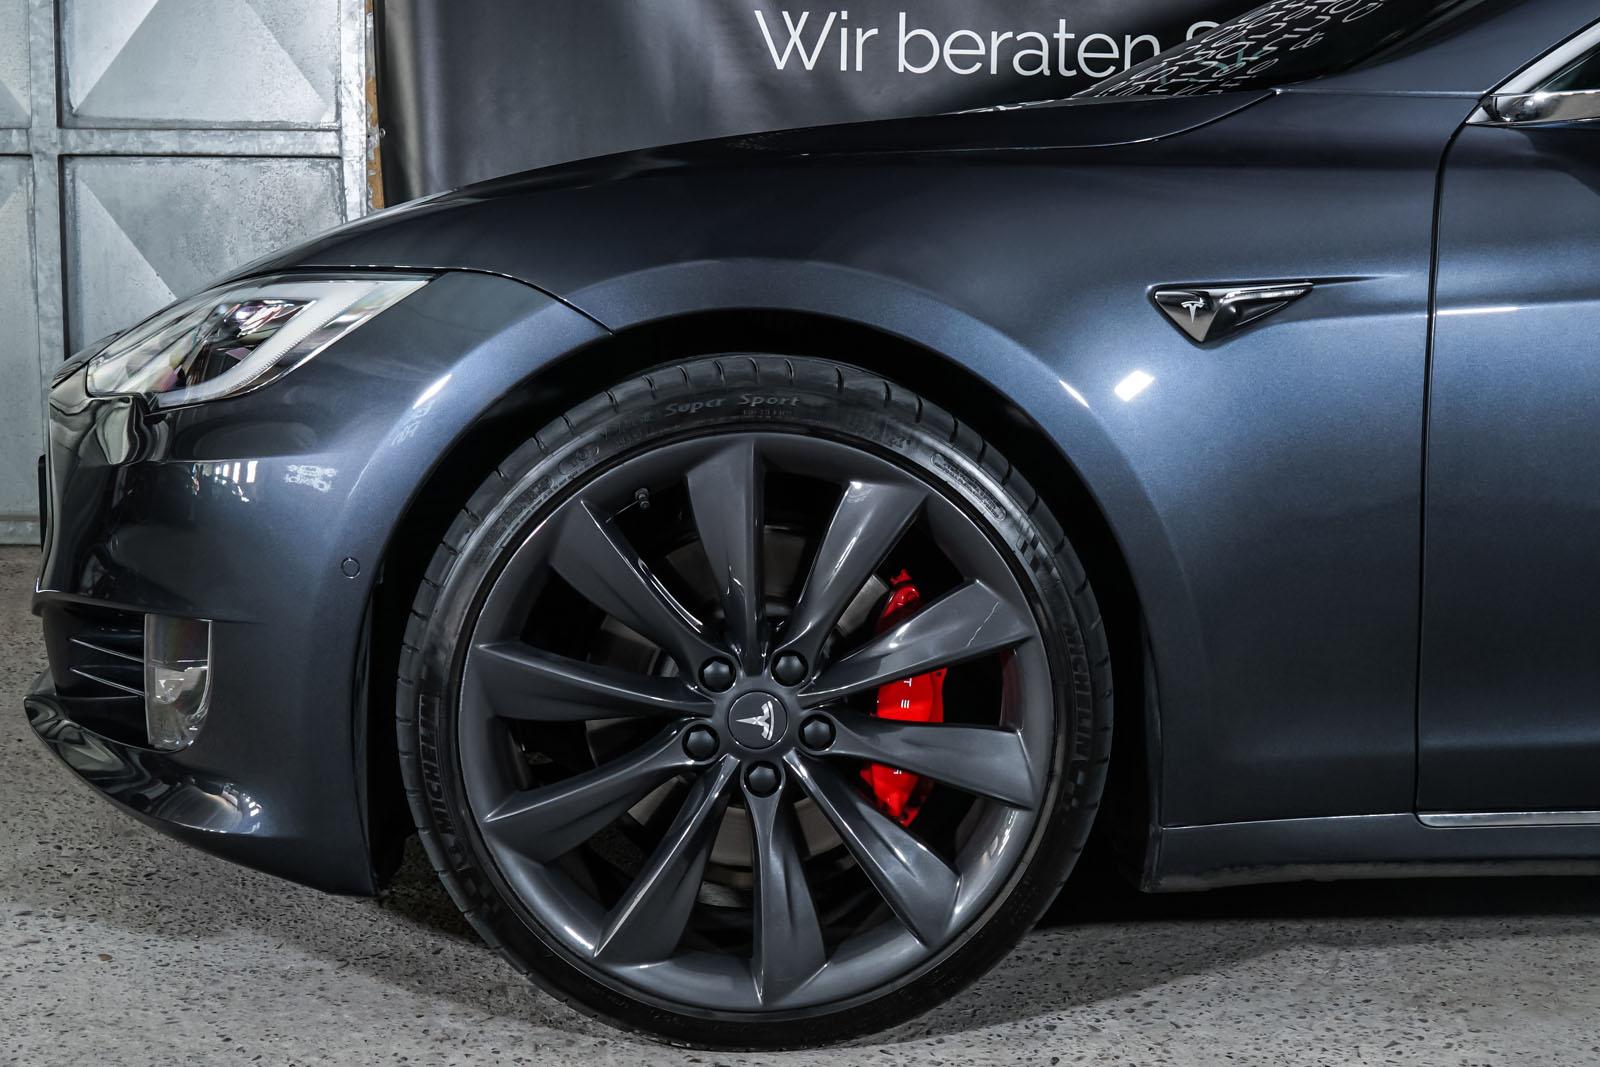 Tesla_ModelS_P100D_MidnightSilver_Black_TES-6539_3_w